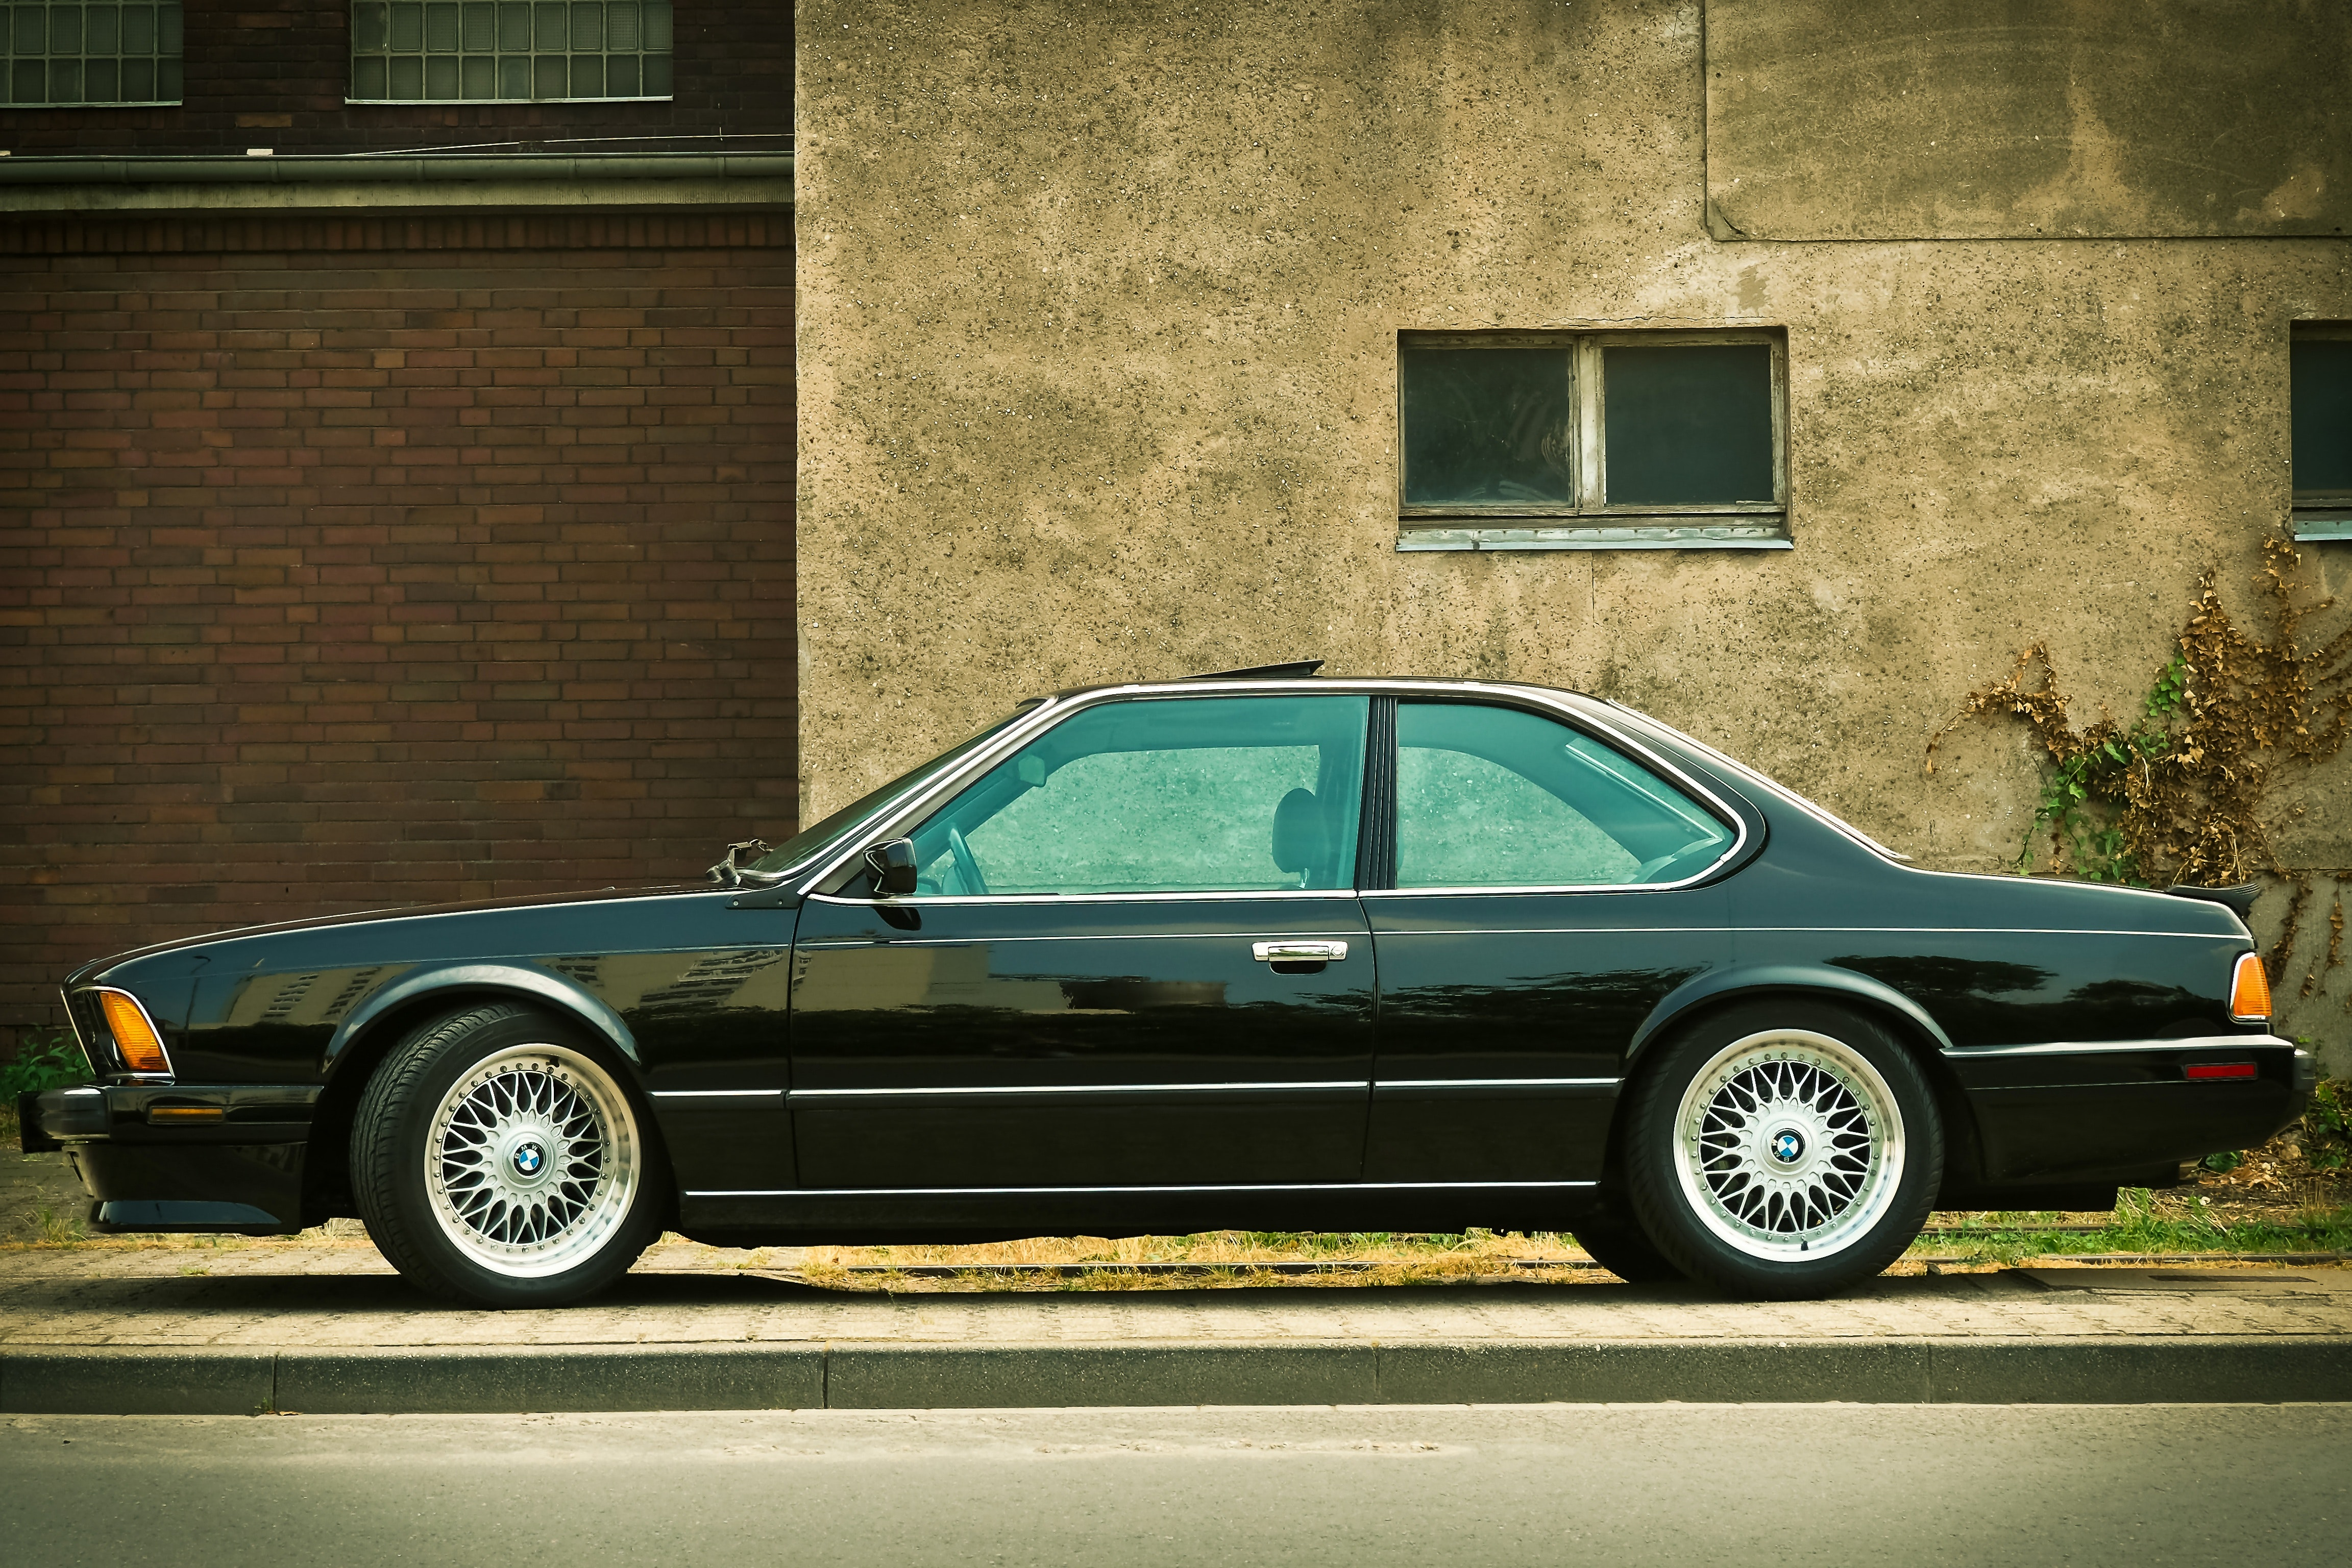 Black Sedan Parked Near Gray House, Asphalt, Automotive, Car, Classic, HQ Photo